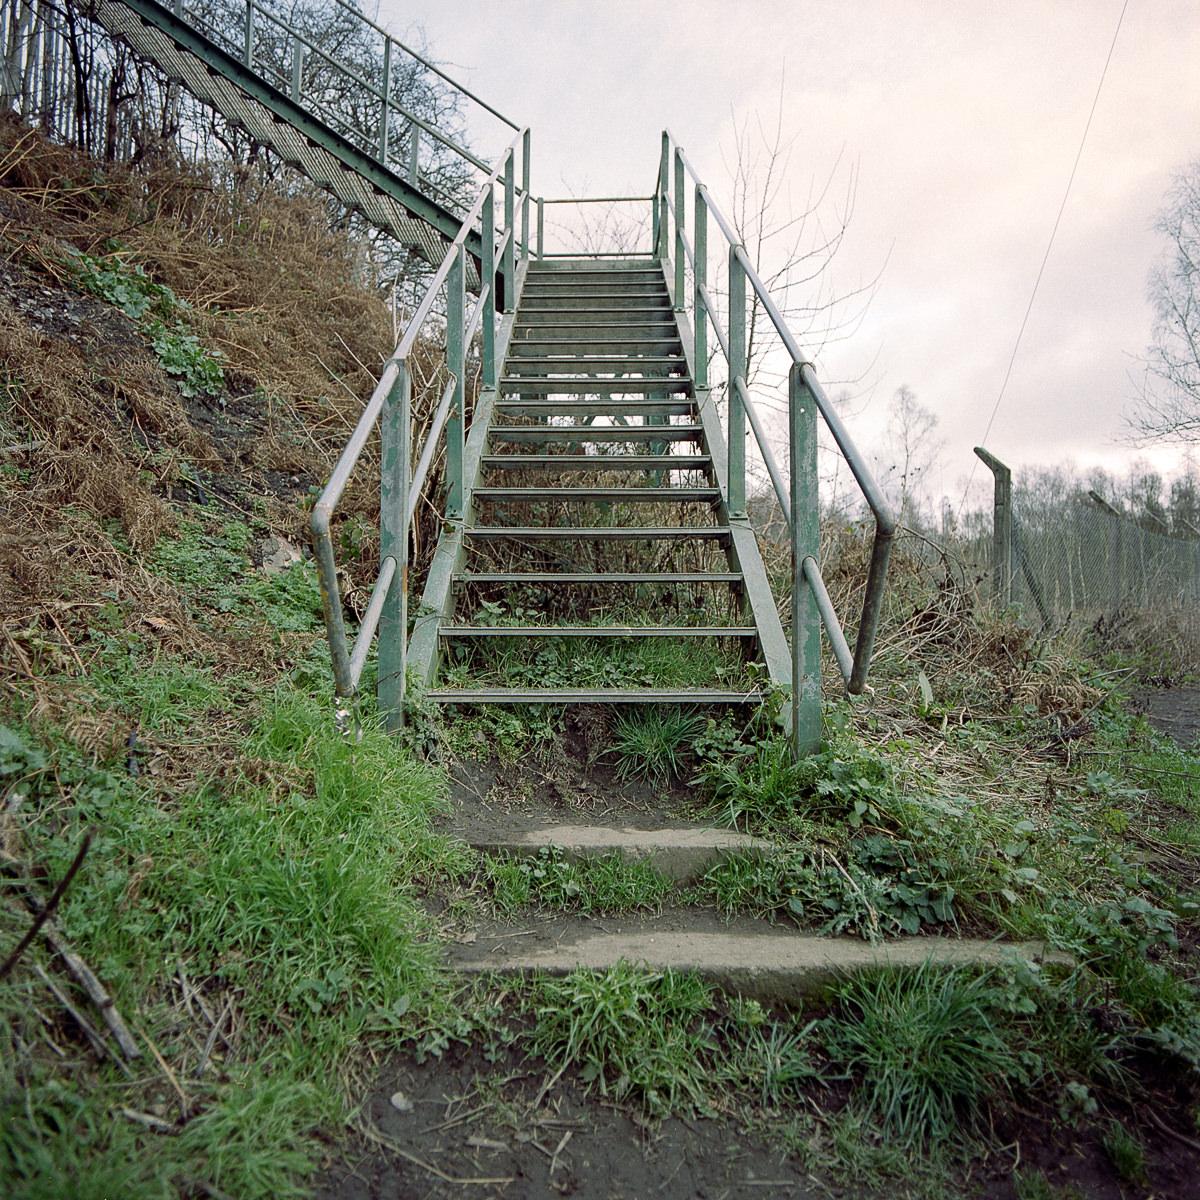 River Walk contemporary landscape photography